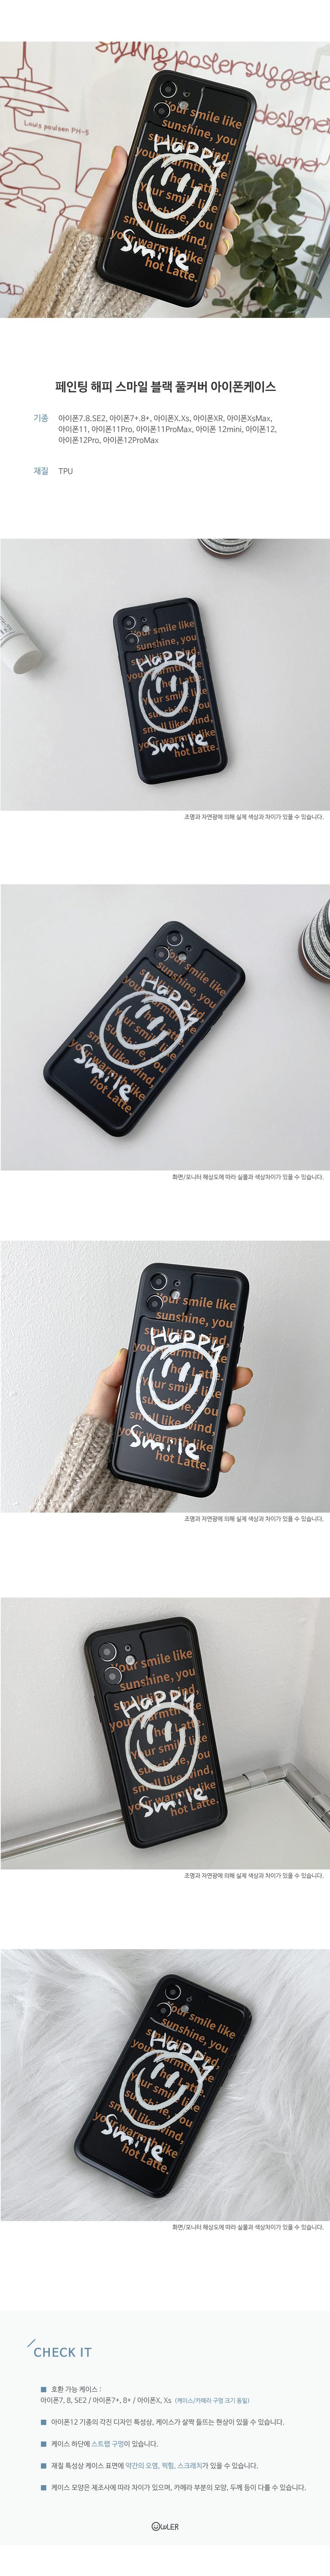 Painting Happy Smile Black iPhone Case